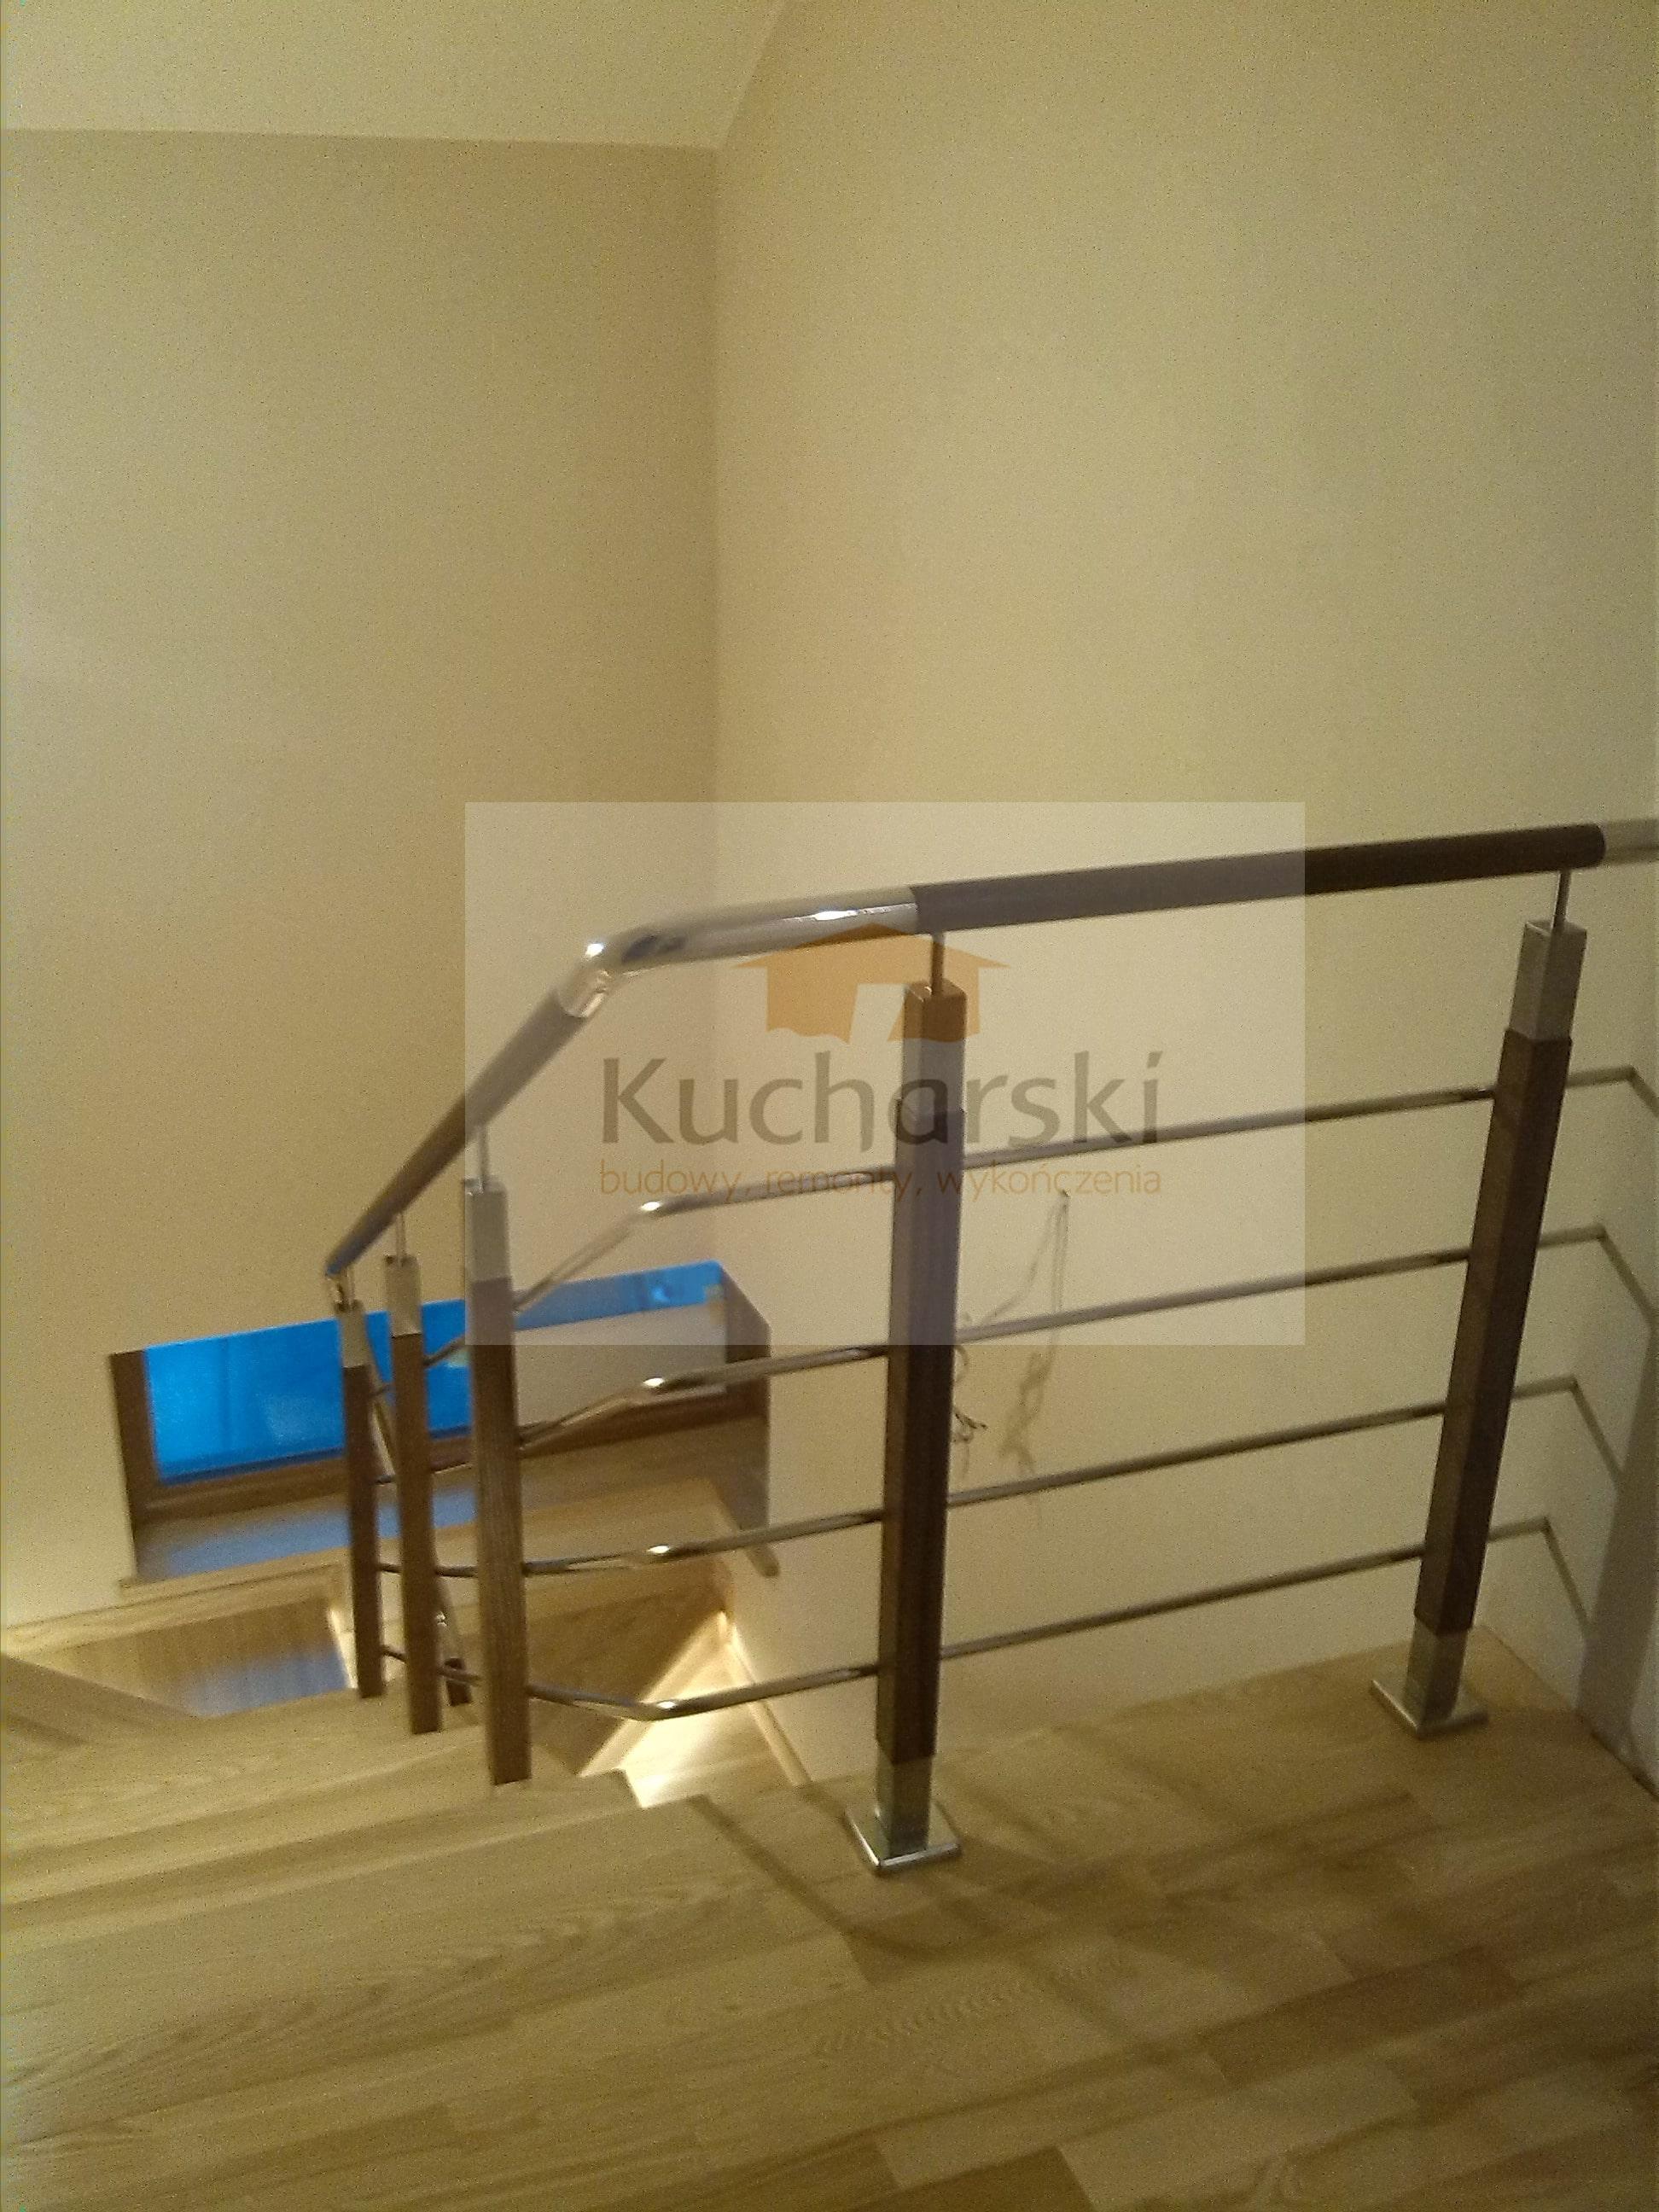 balustrady schodowe (2)